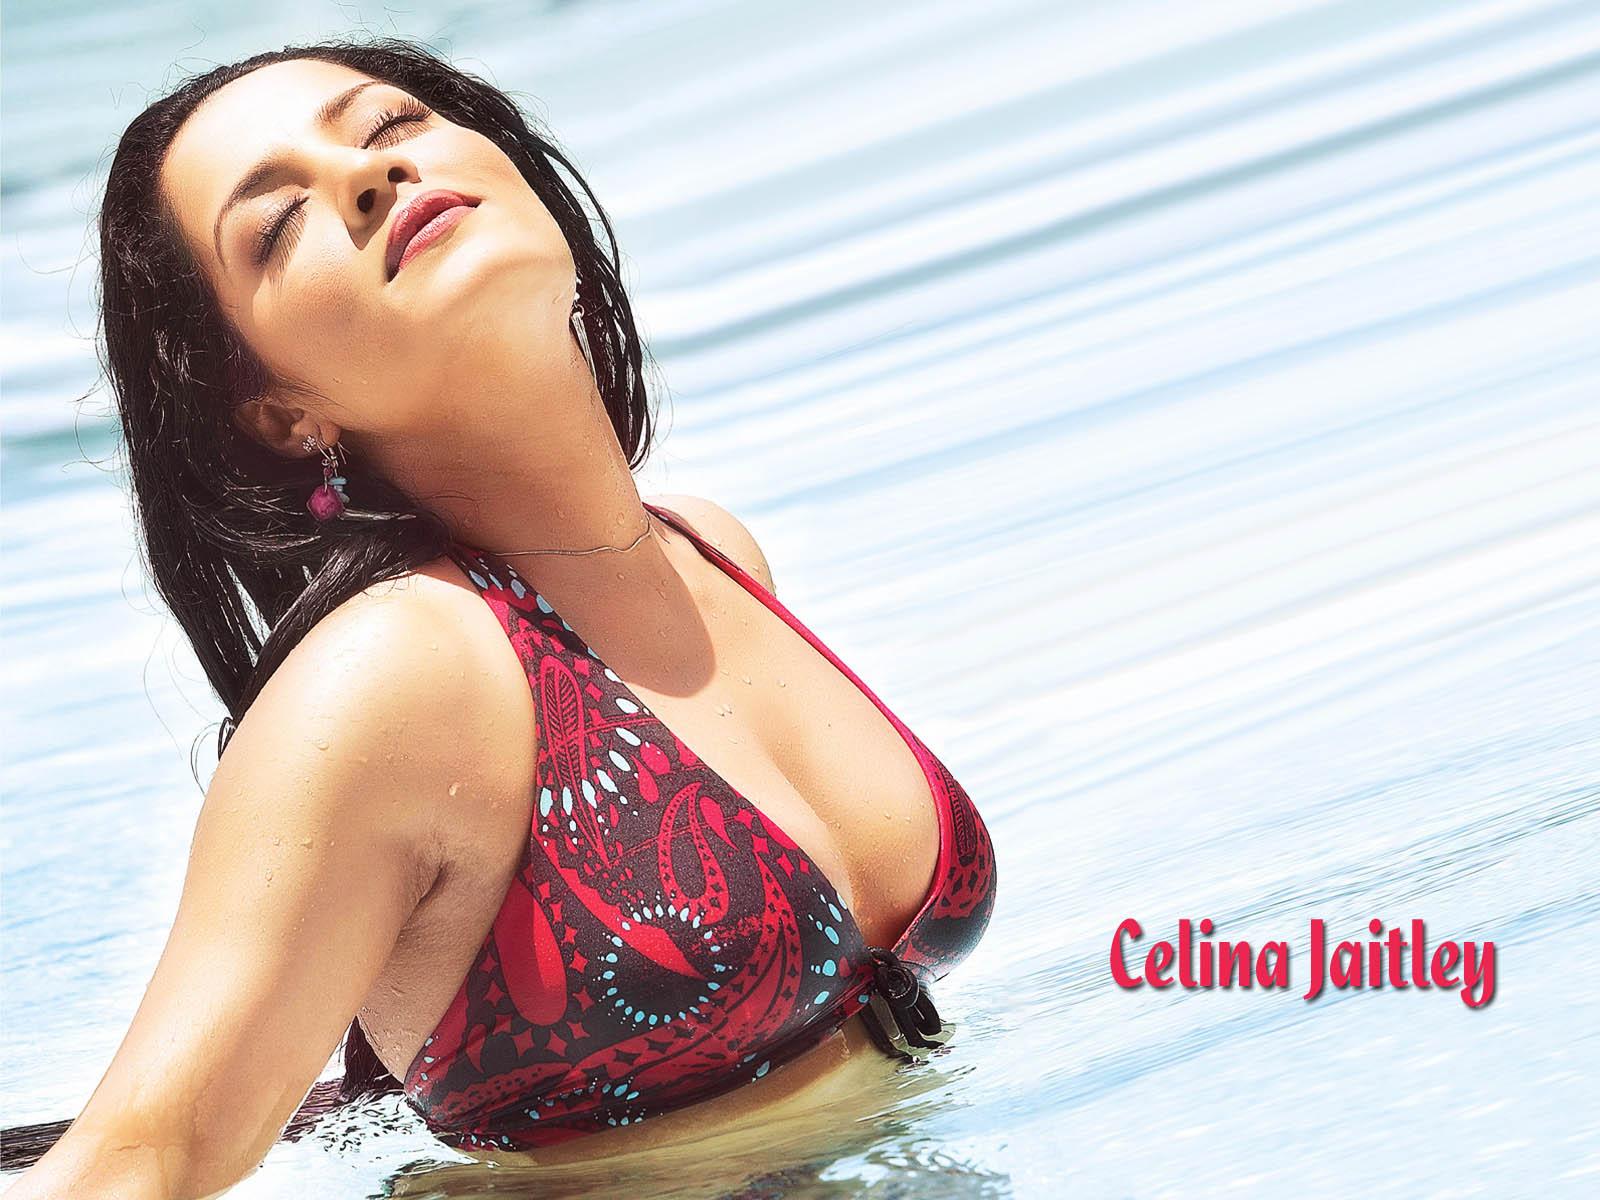 Celina jaitly sexy nude